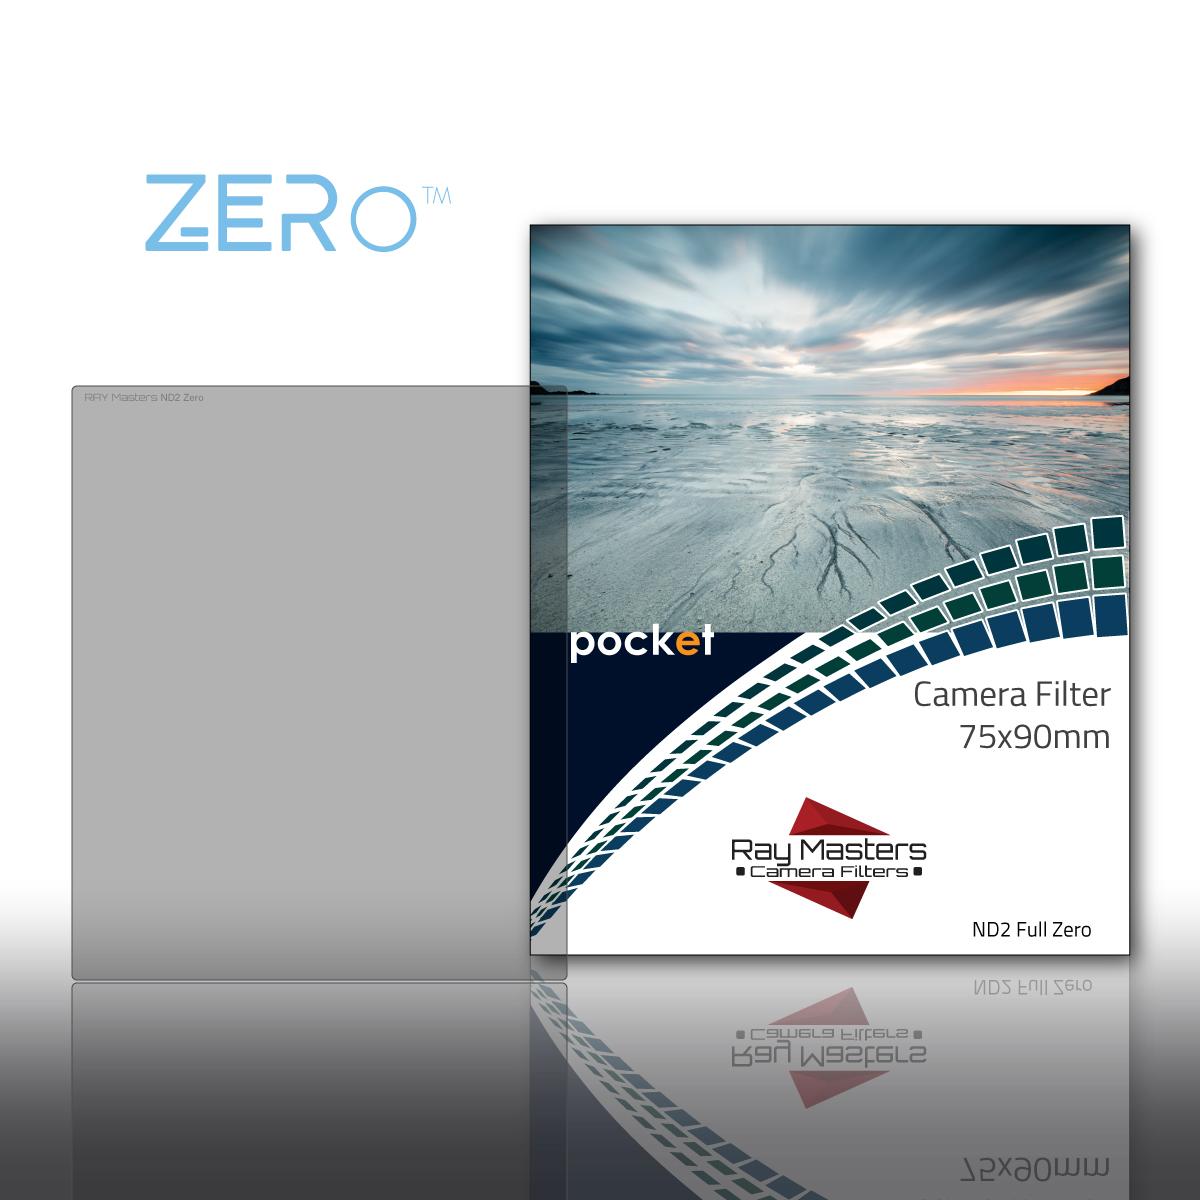 Pocket_ND2F_Zero